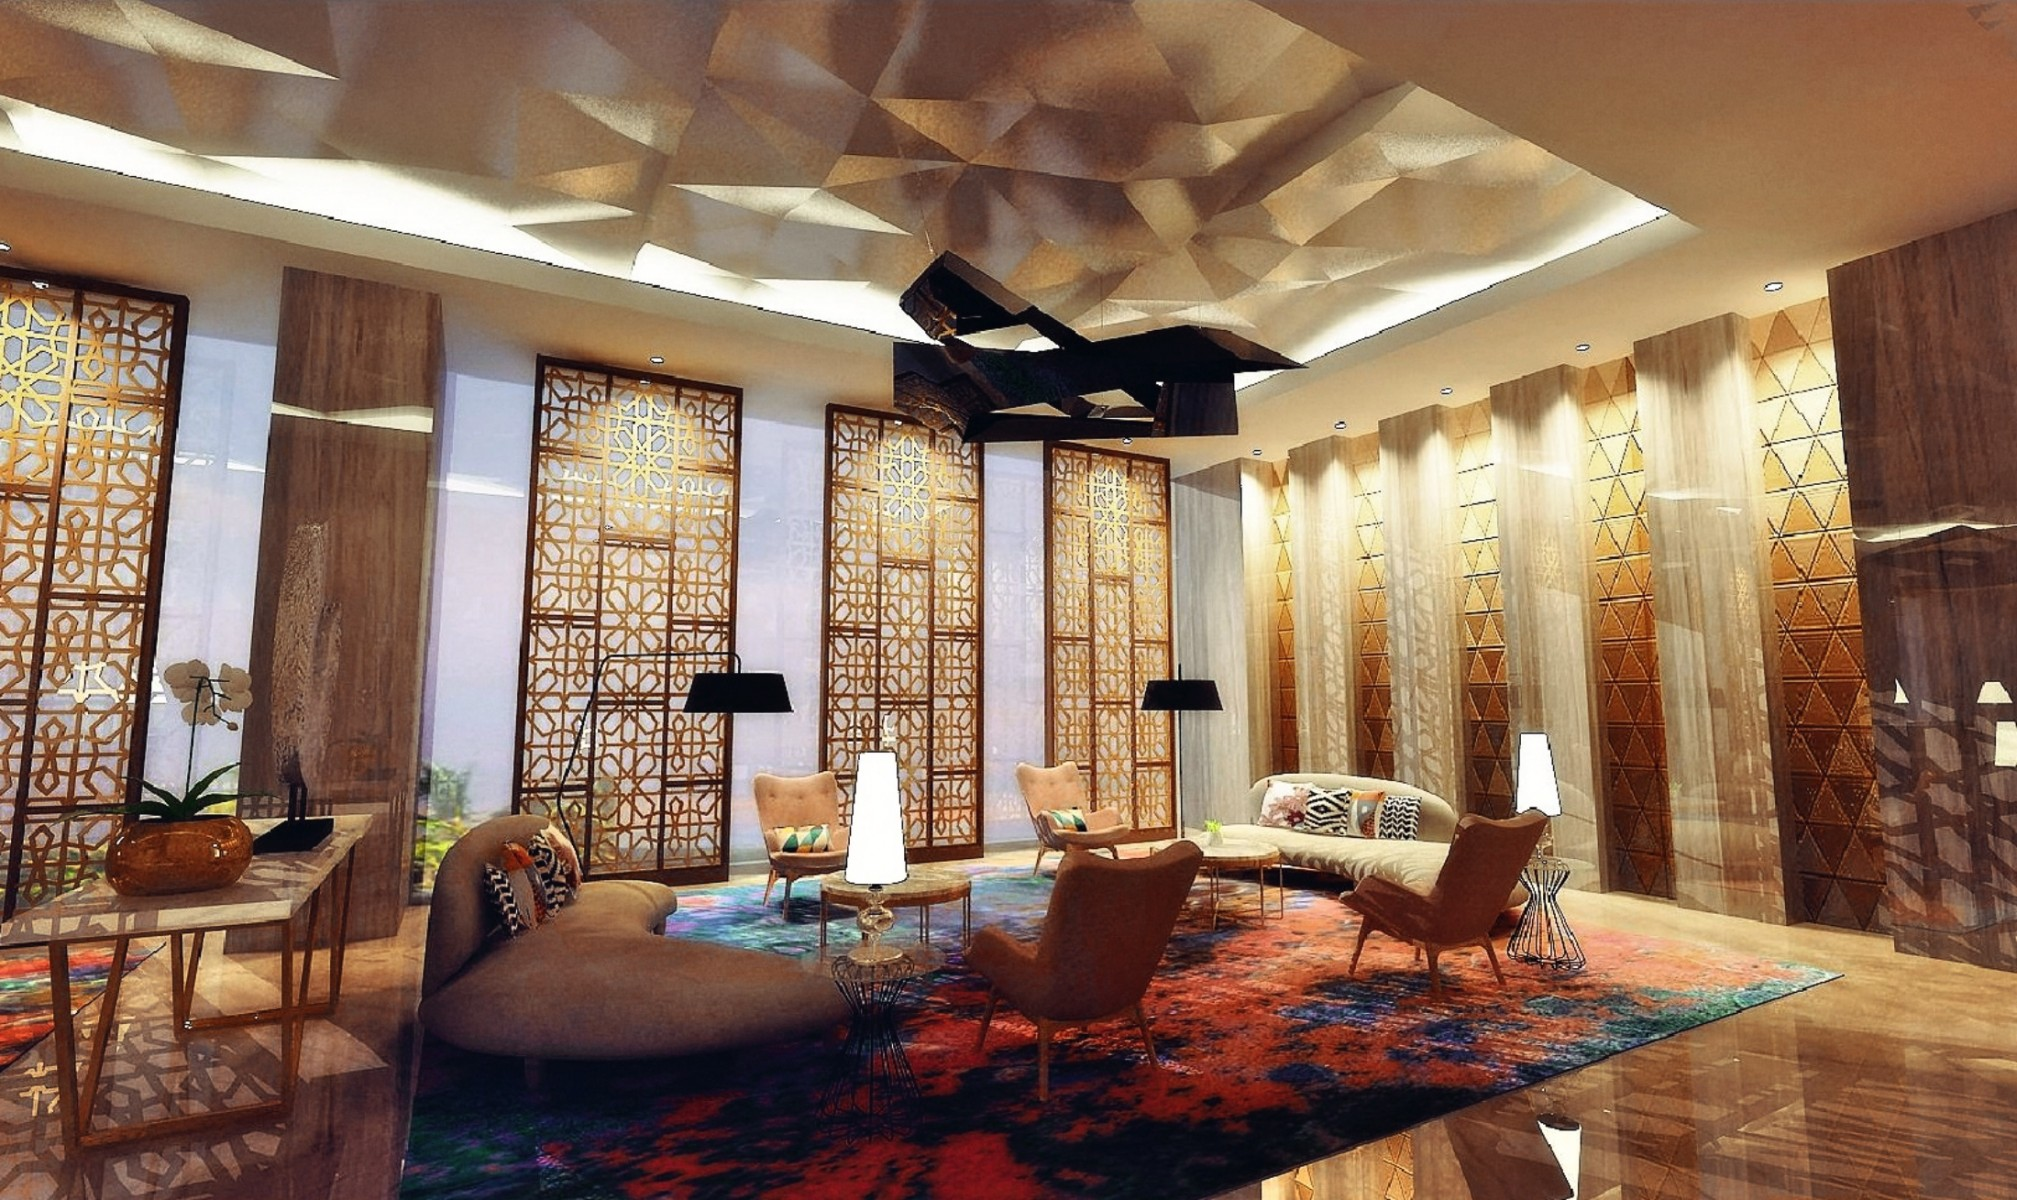 Orchardz Hotels Book Direct Today Sabun Mandi Harmoni See More Photos